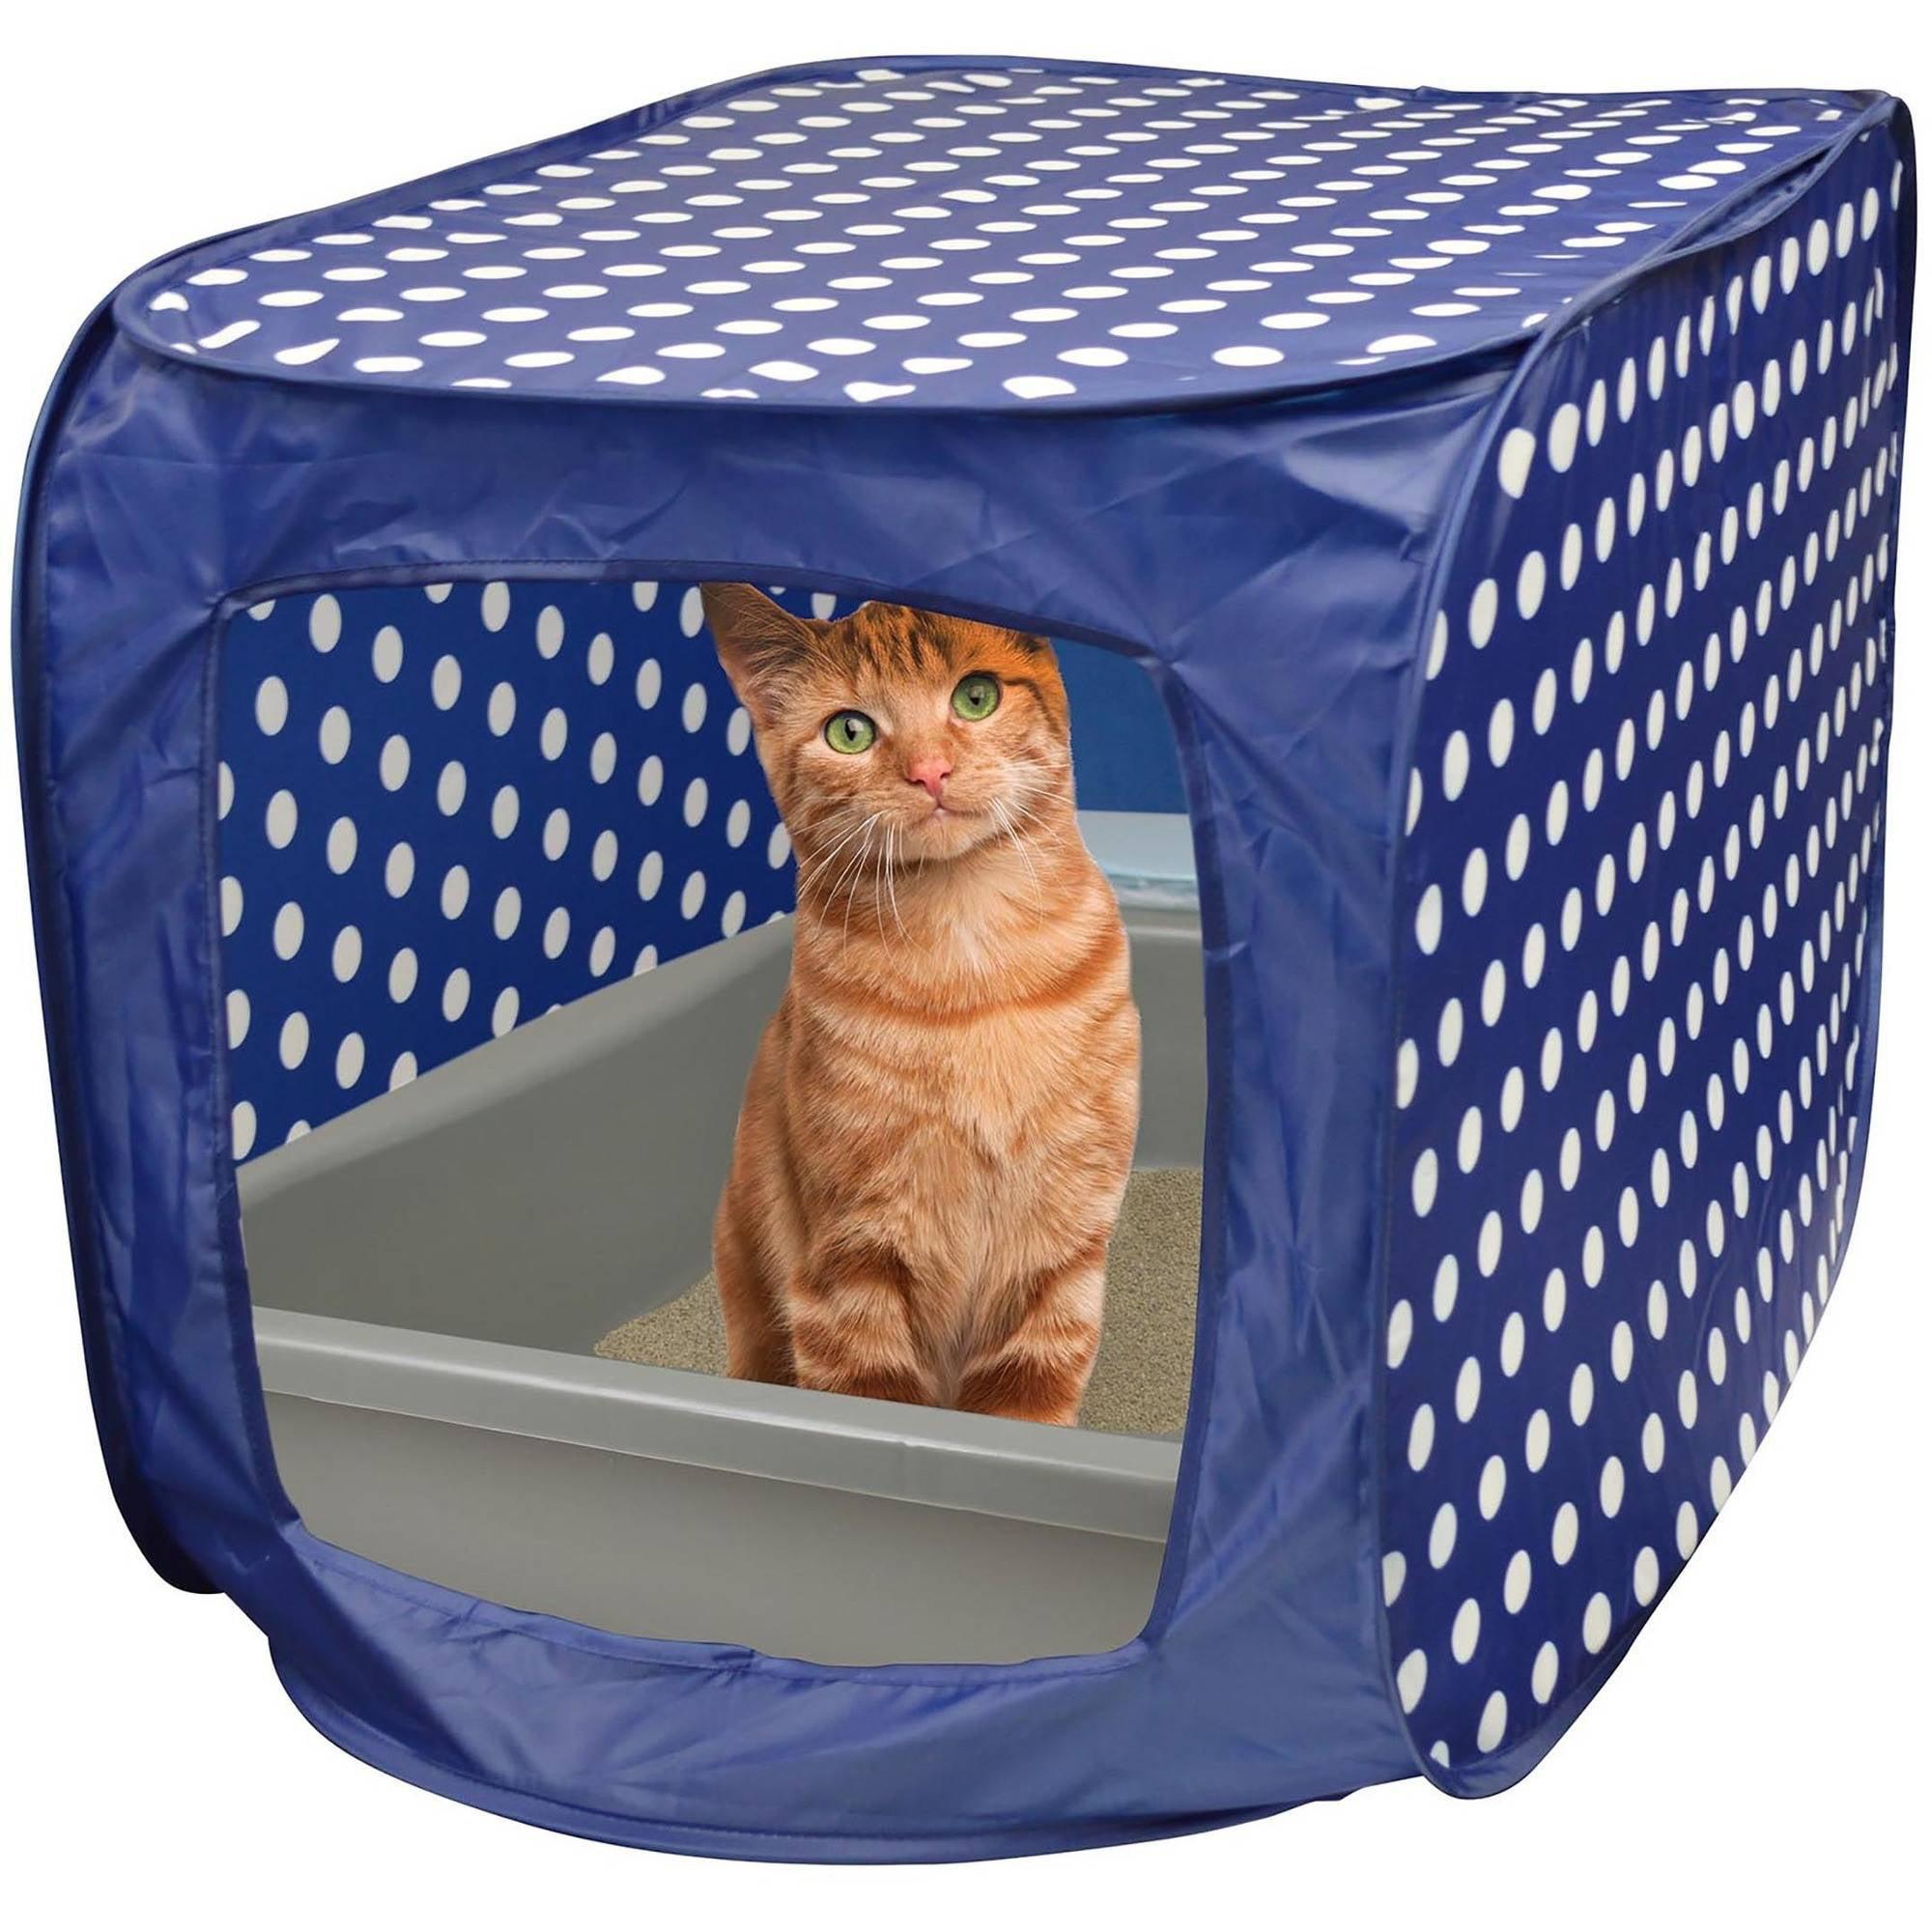 Pet Zone Cat Litter Box Pop Up Canopy Walmart Com